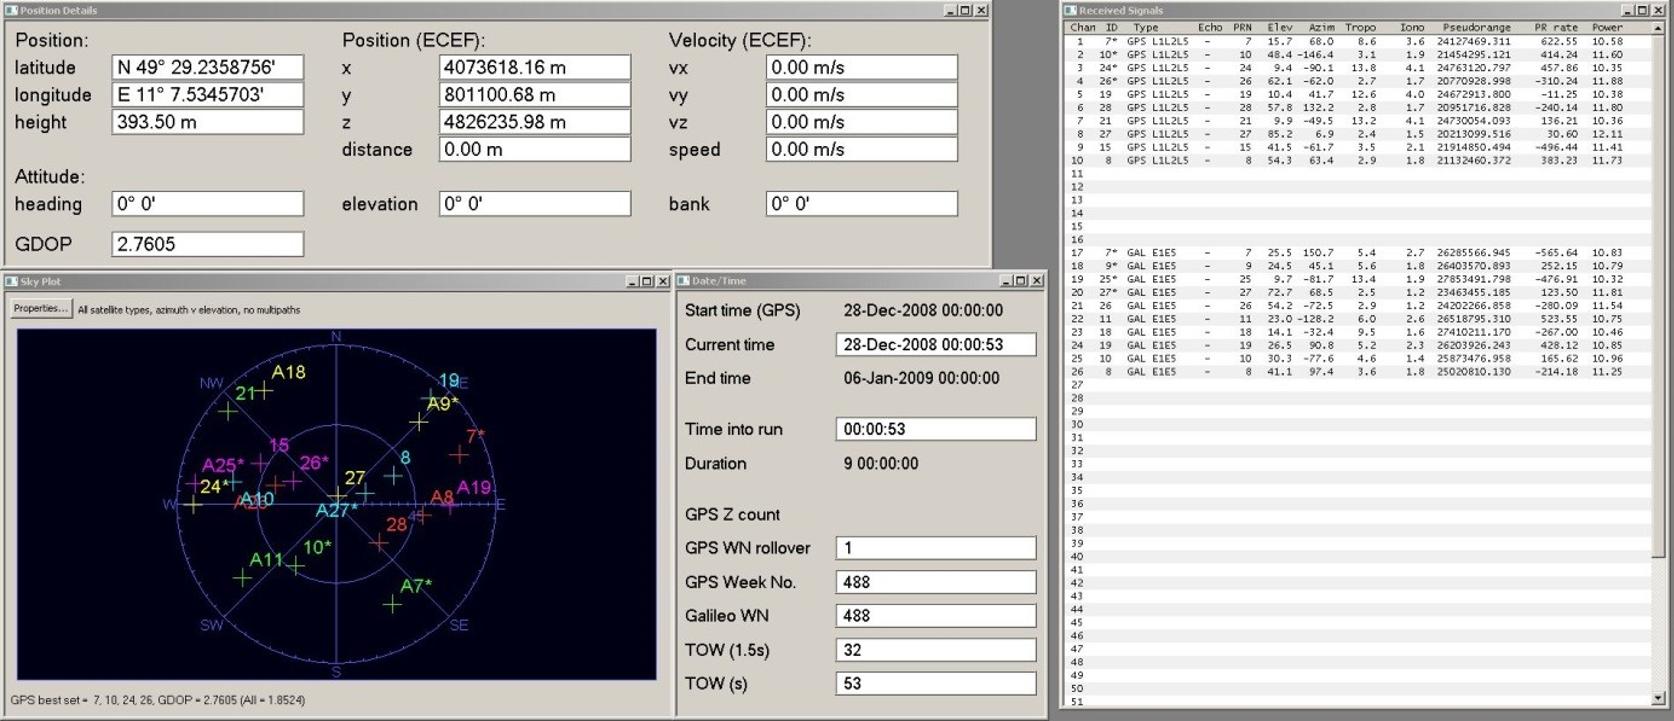 GNSS Software Defined Receiver Metadata Standard